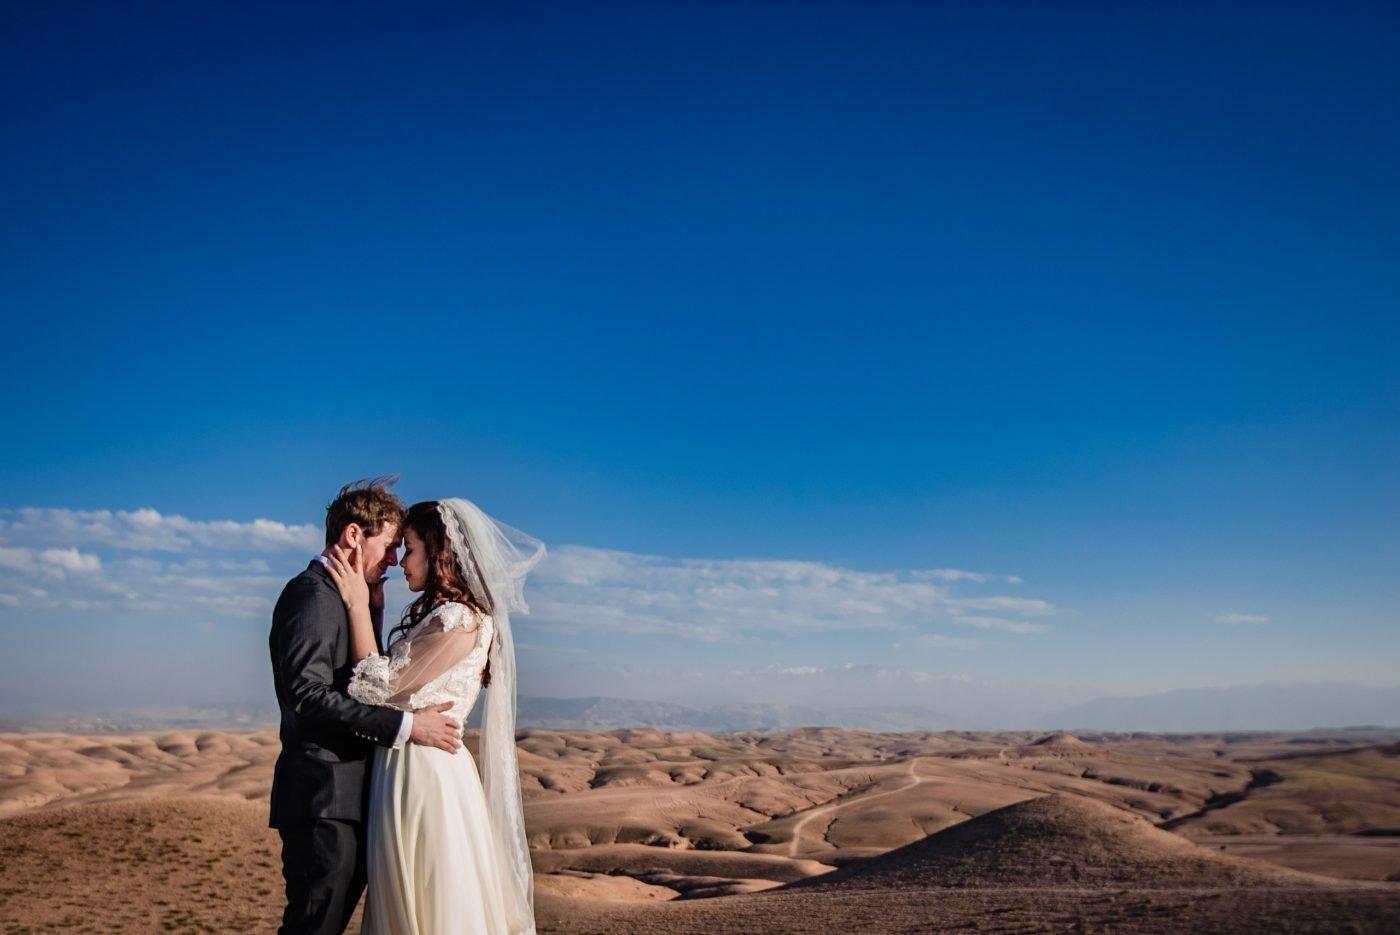 Beautiful Destination Wedding photography in Agafay Desert